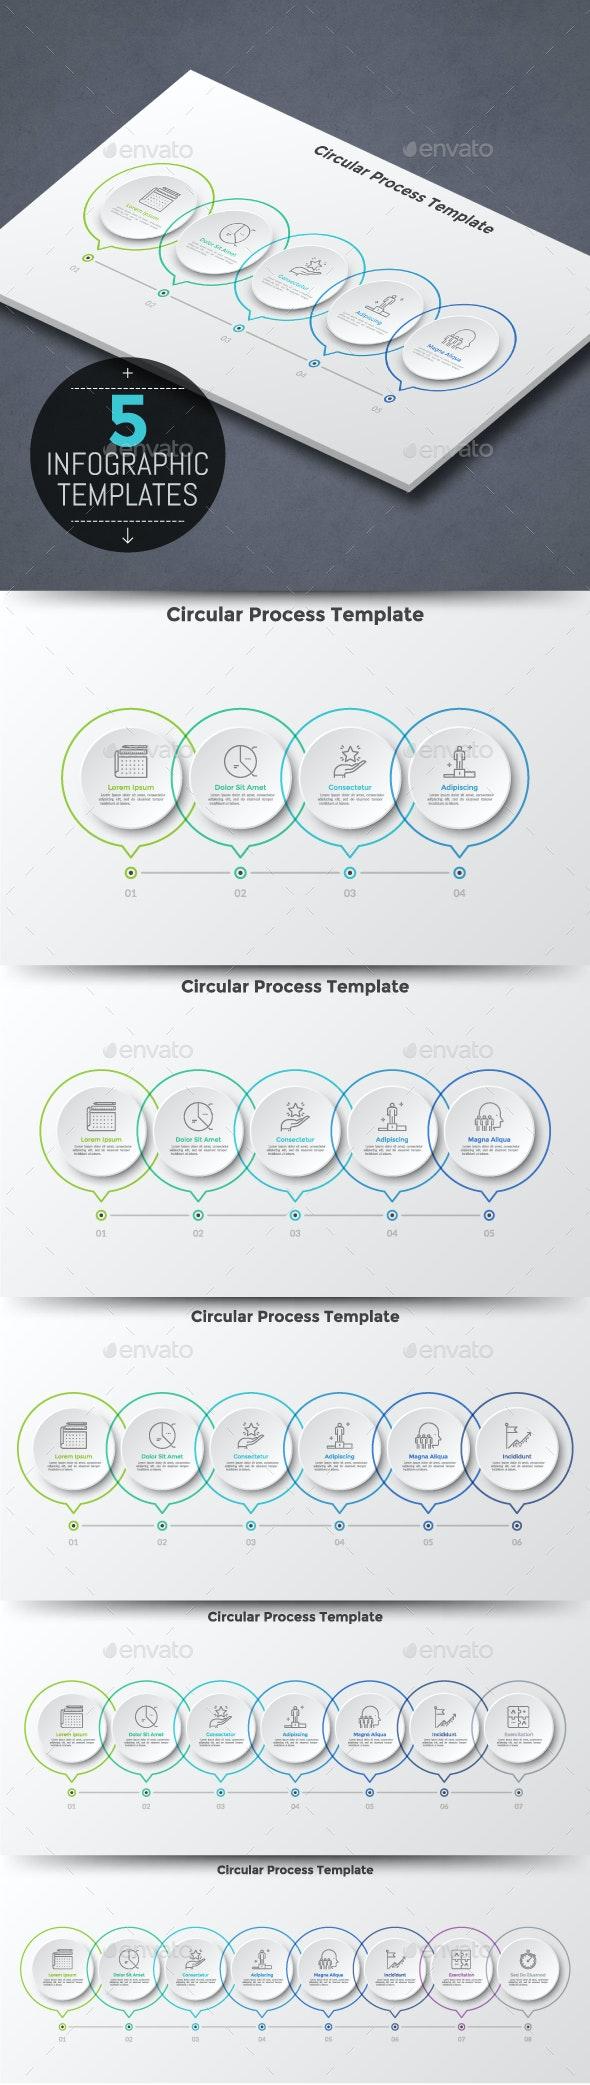 5 Process Infographic Templates - Infographics